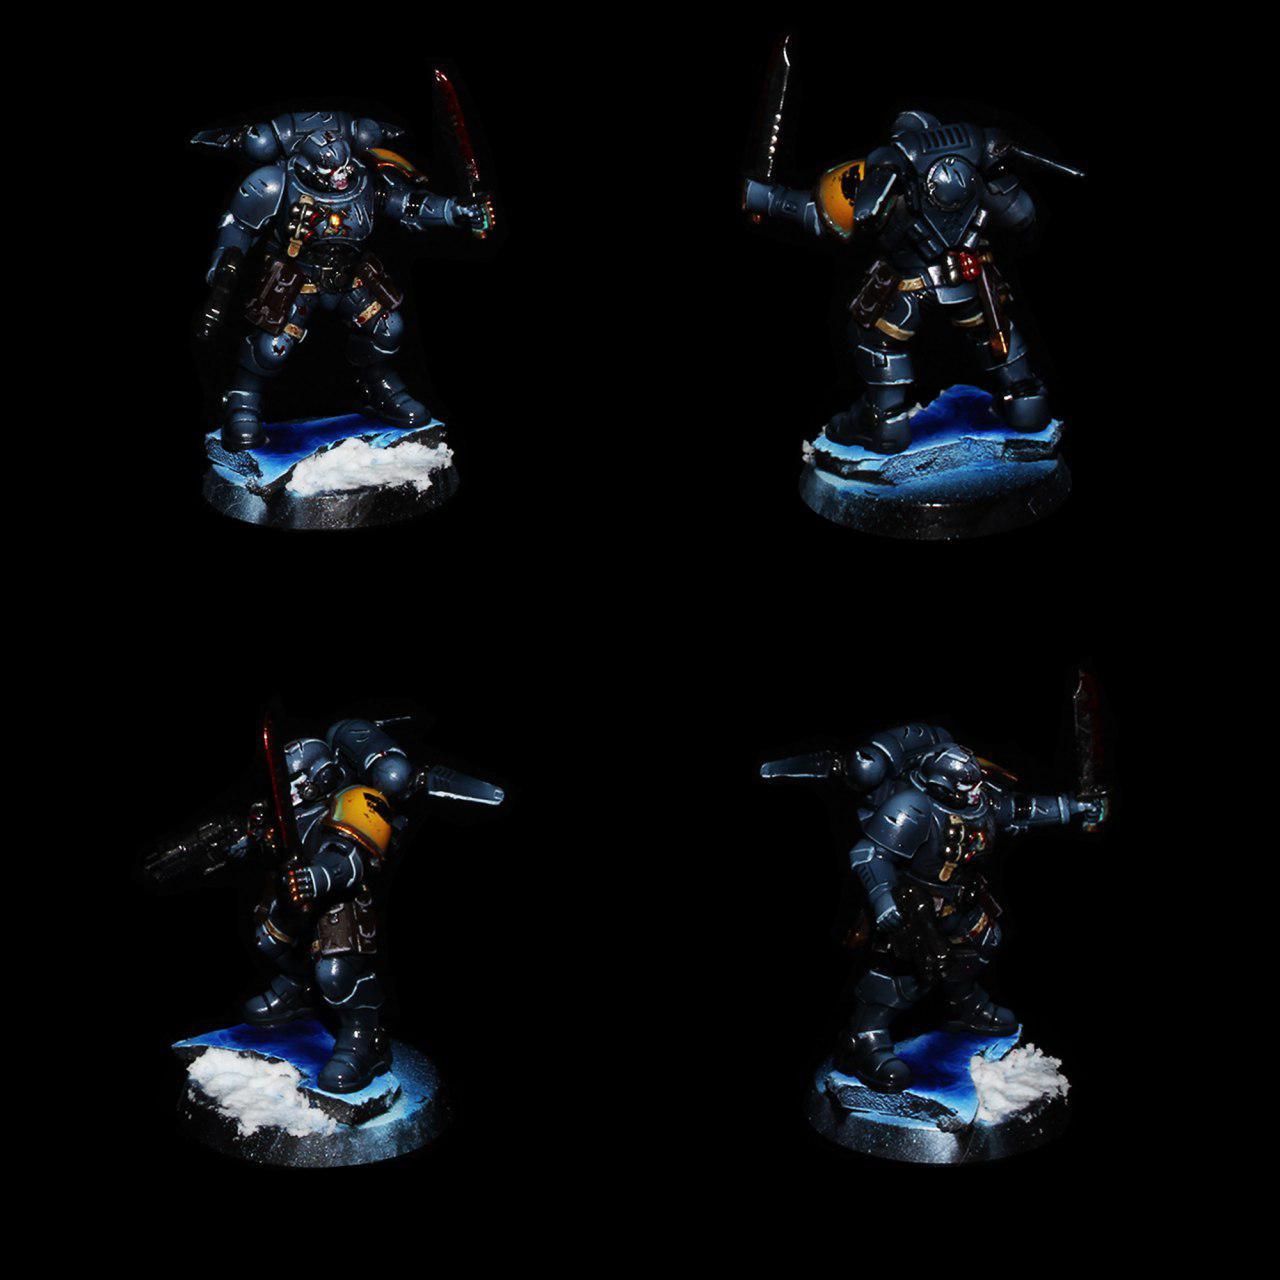 Space Wolves Primaris Reivers